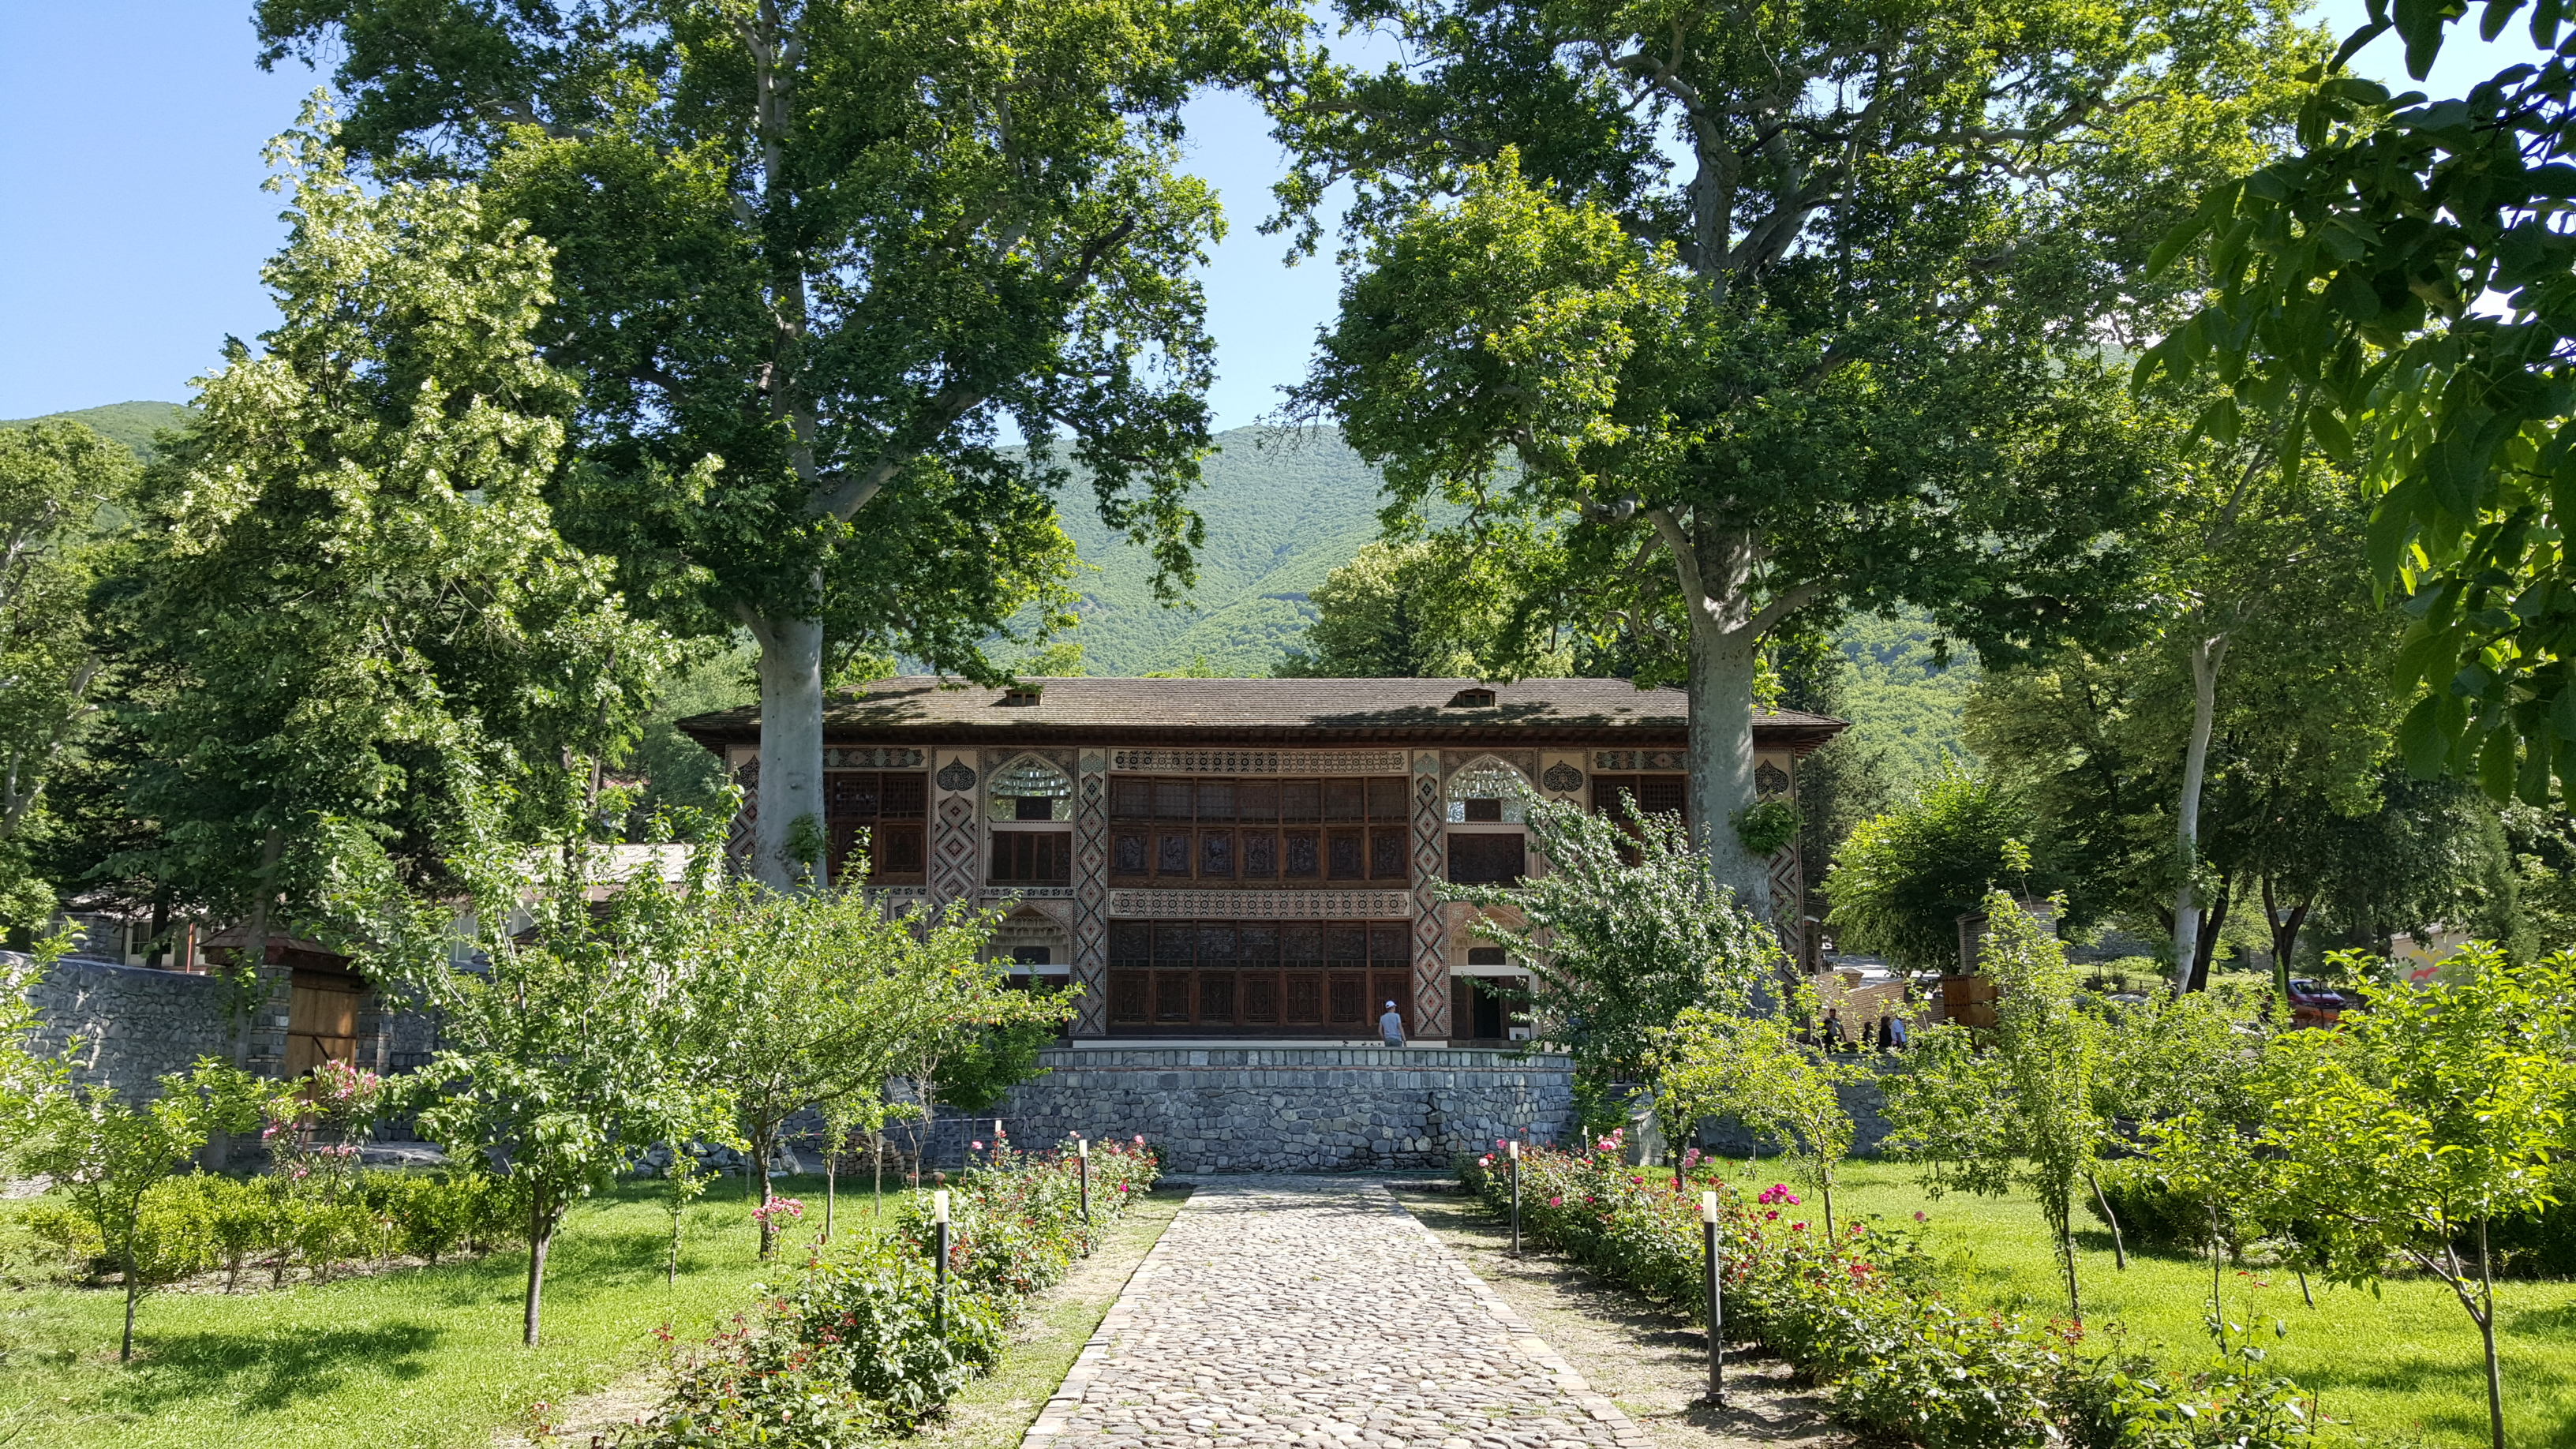 Giardino del Palazzo del Khan presso Palace of Shaki Khans, ph. PaN